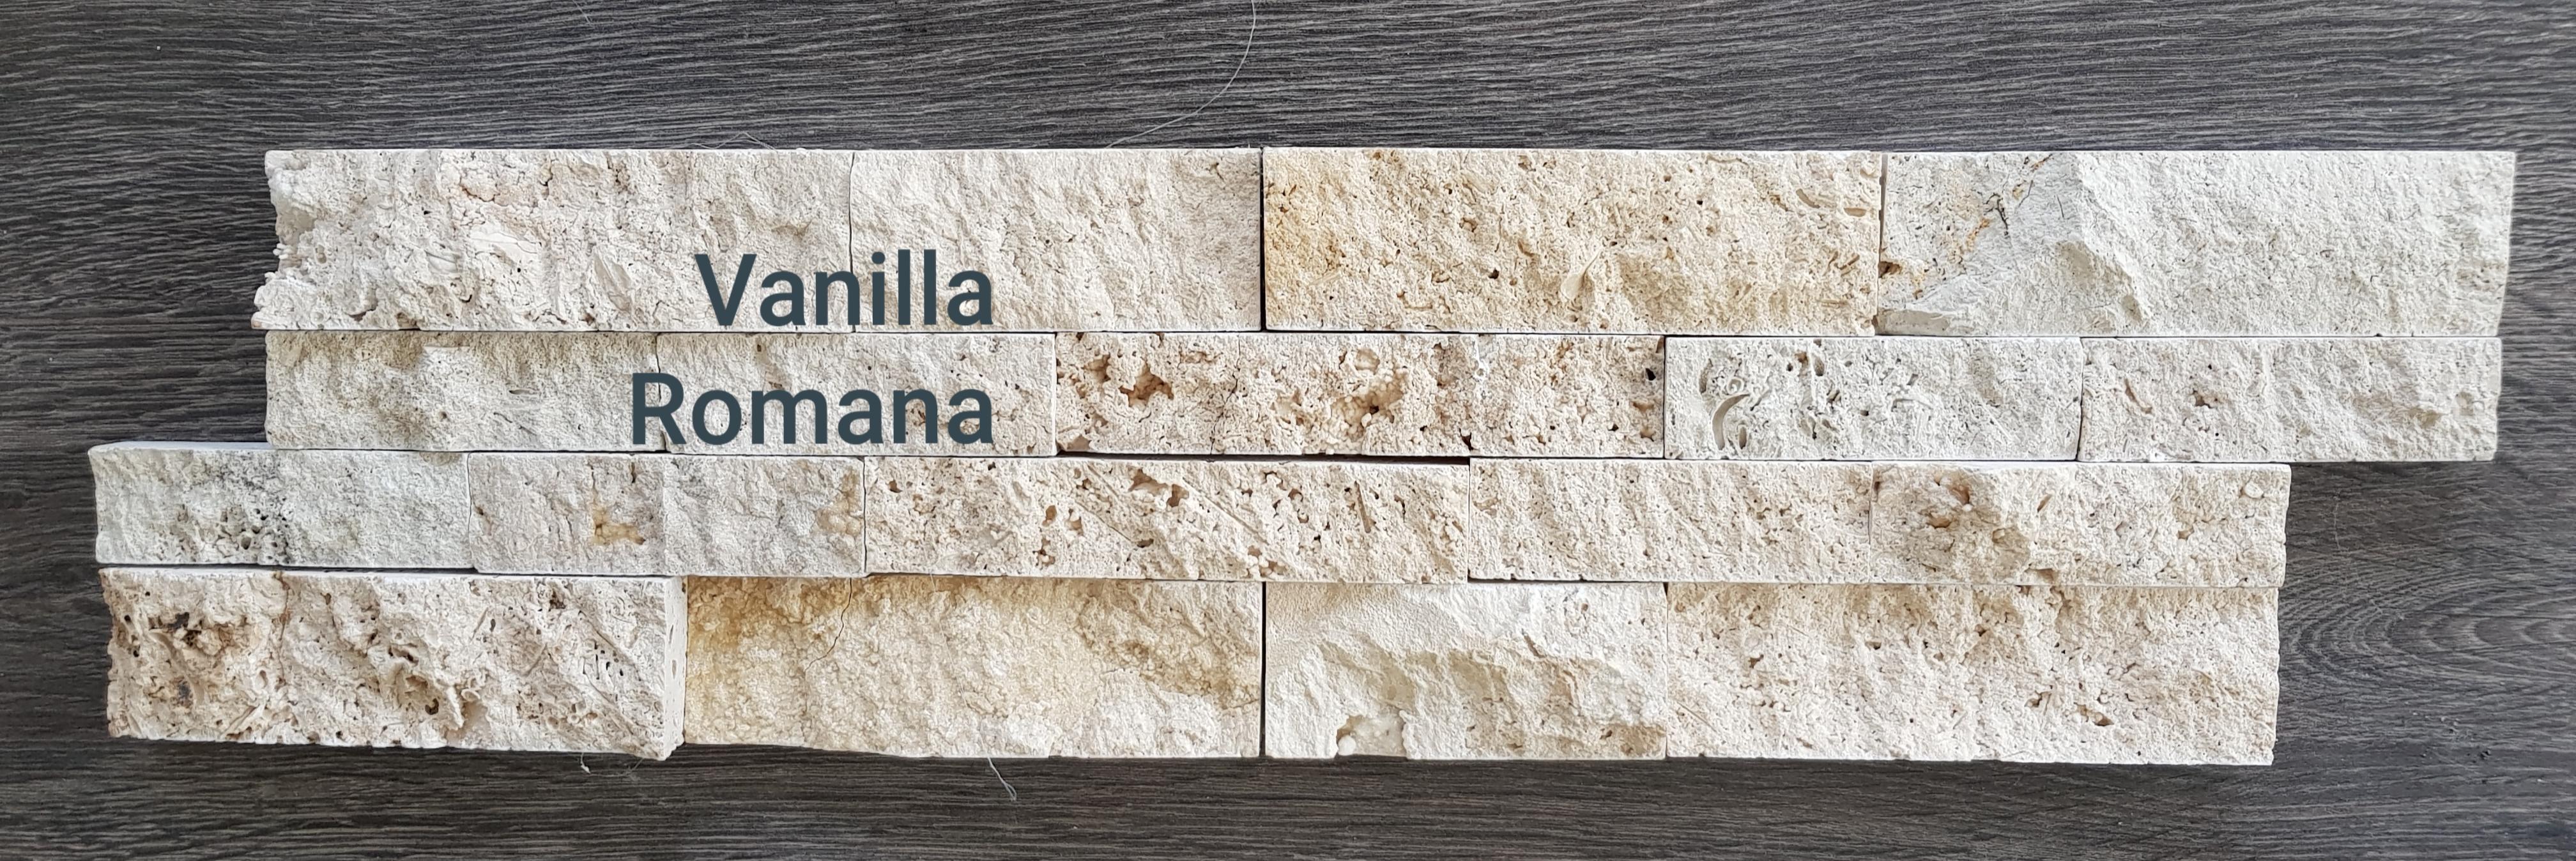 Verblender Travertin Vanilla Romana 60x15x2-3cm